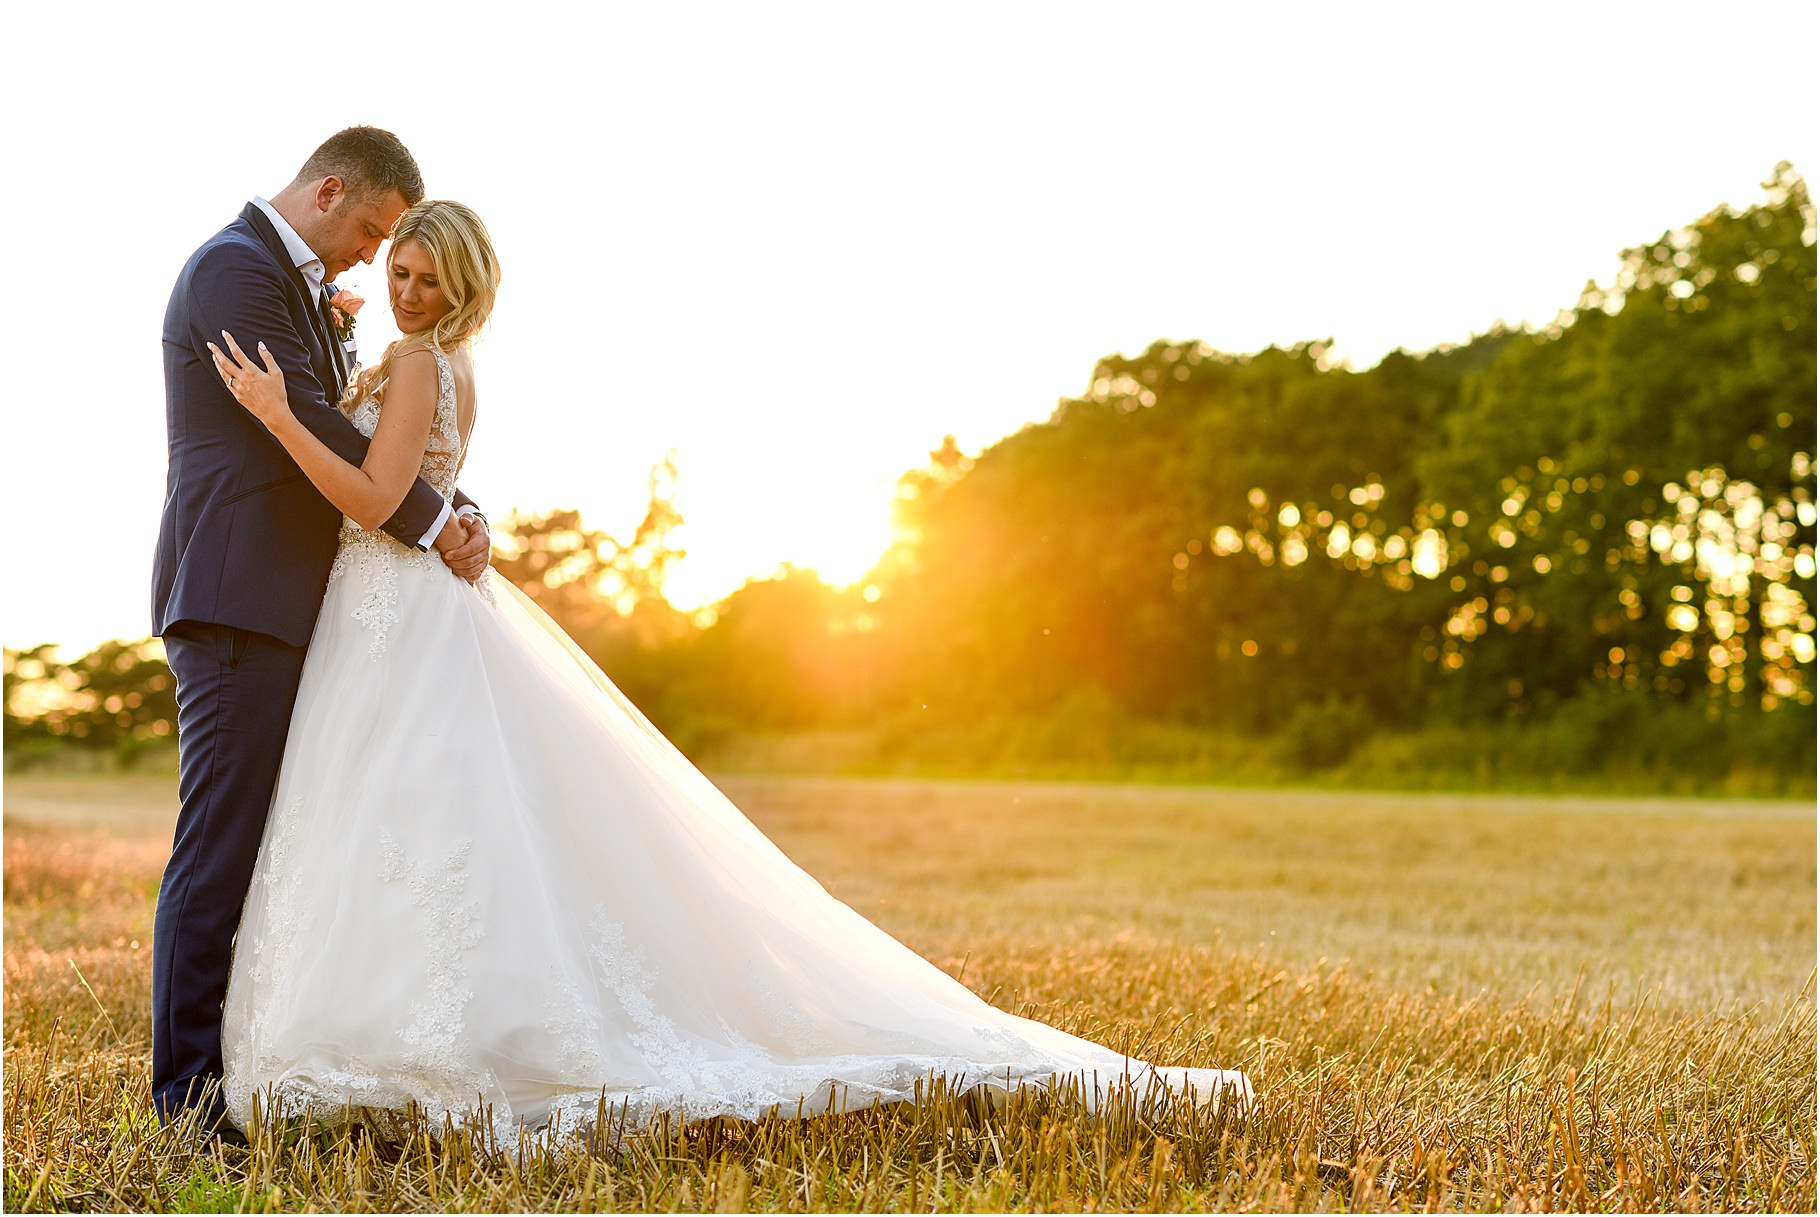 dan-wootton-photography-2017-weddings-085.jpg